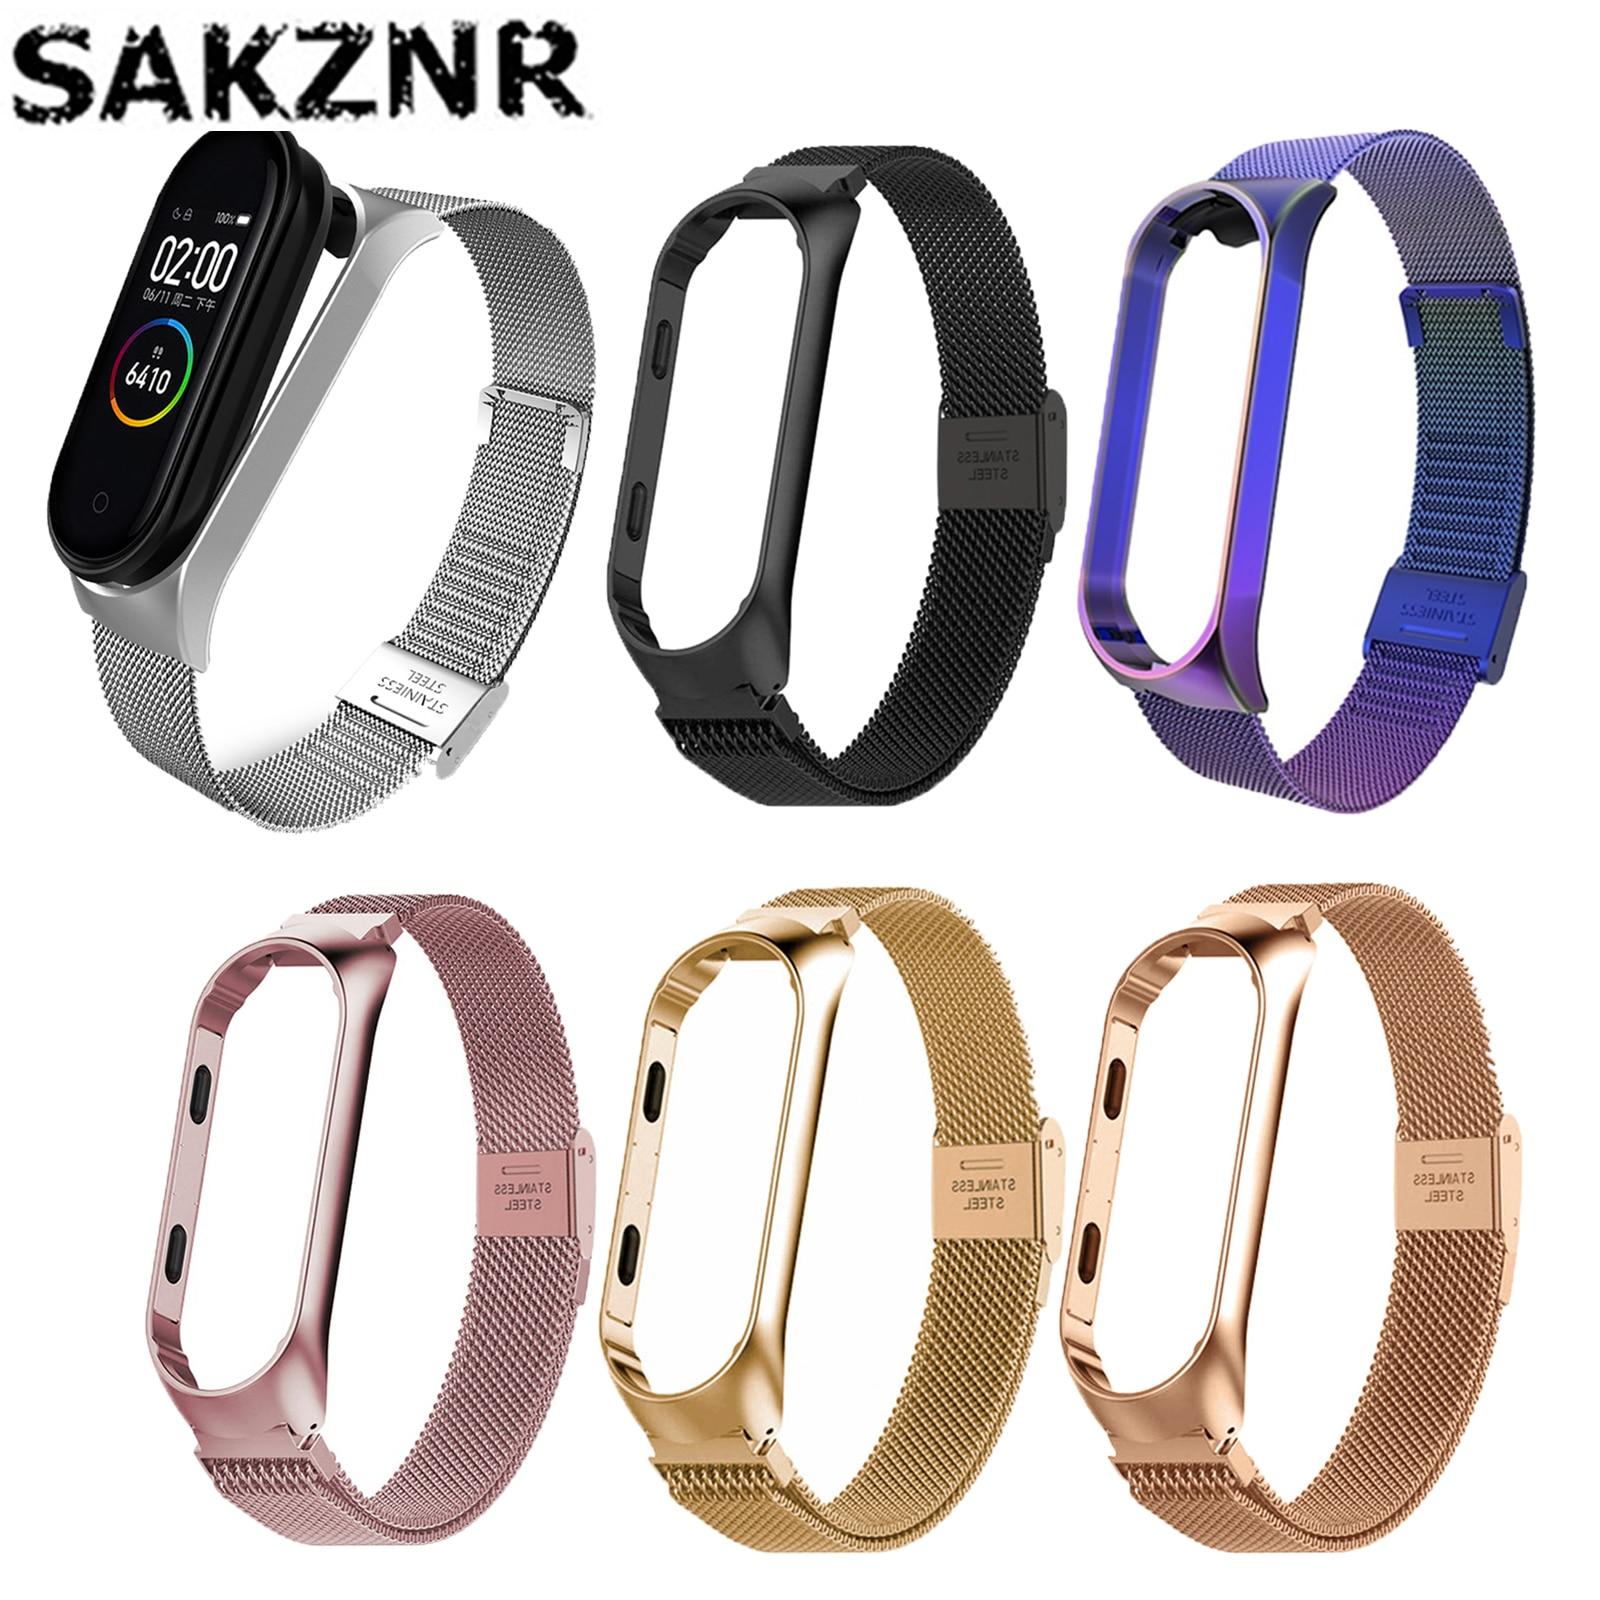 Fashion Metal Strap for Xiaomi Mi Band 5 4 3 Watch Strap Men Women Straps Bracelets Stainless Steel Wristband For Mi Band 4 5 3